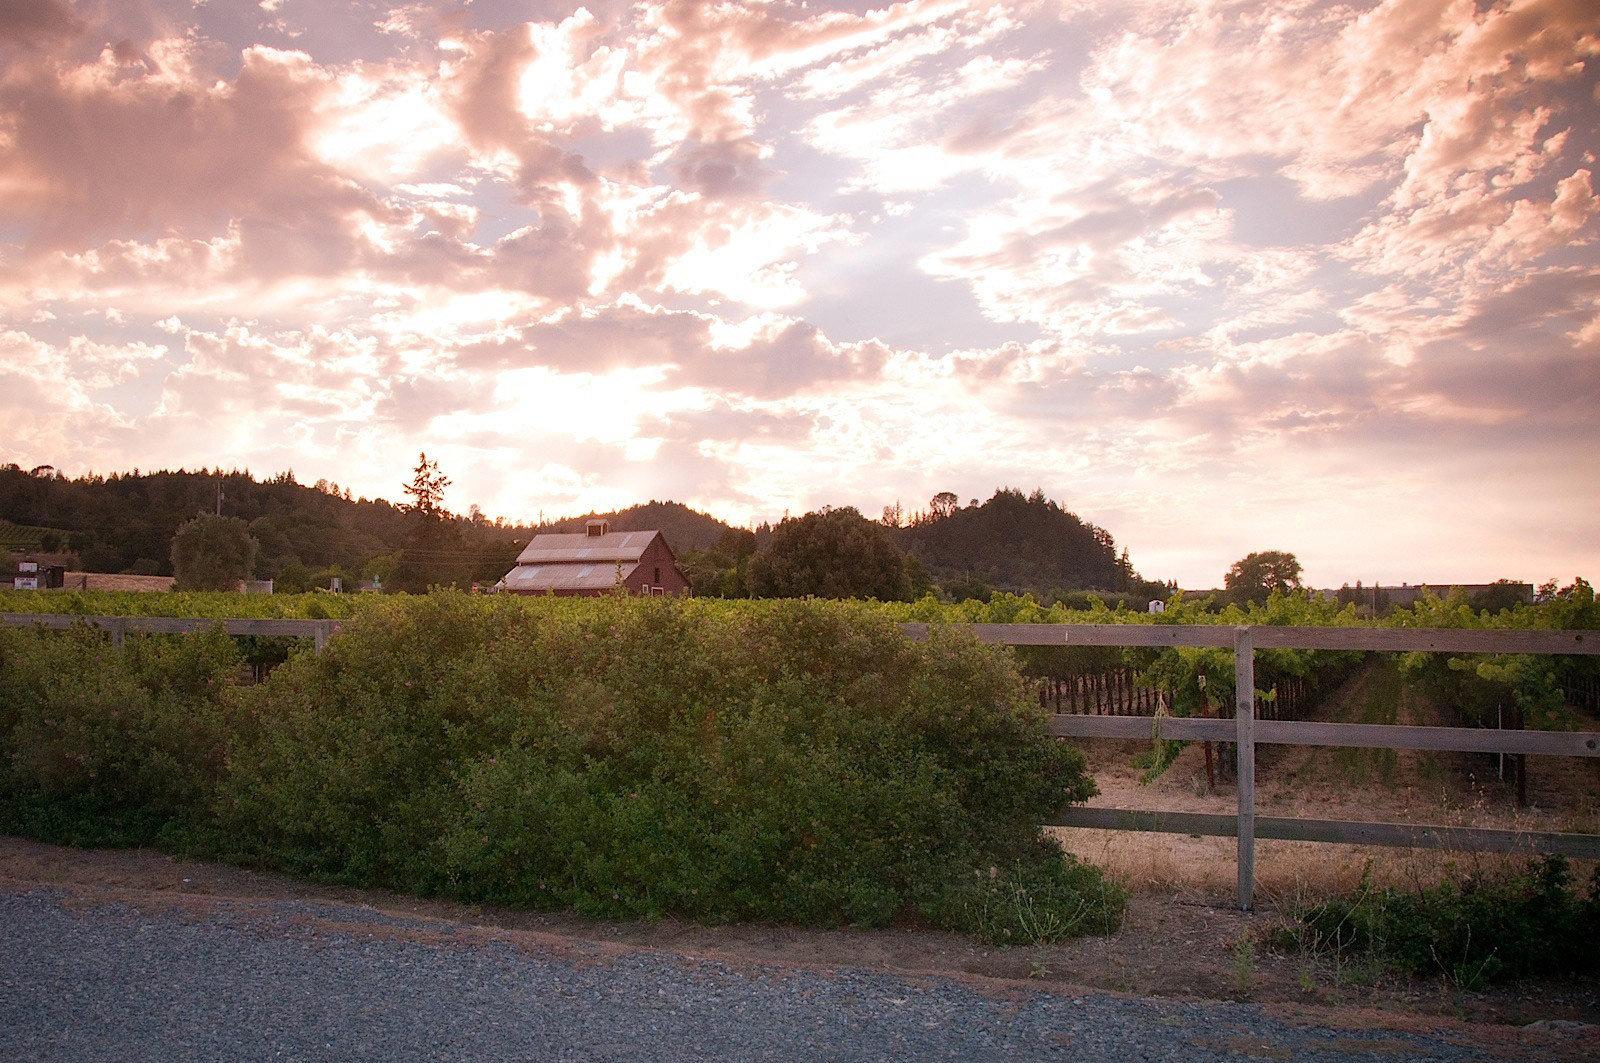 grass sky tree cloud morning Sunset rural area field hill landscape evening sunlight dusk